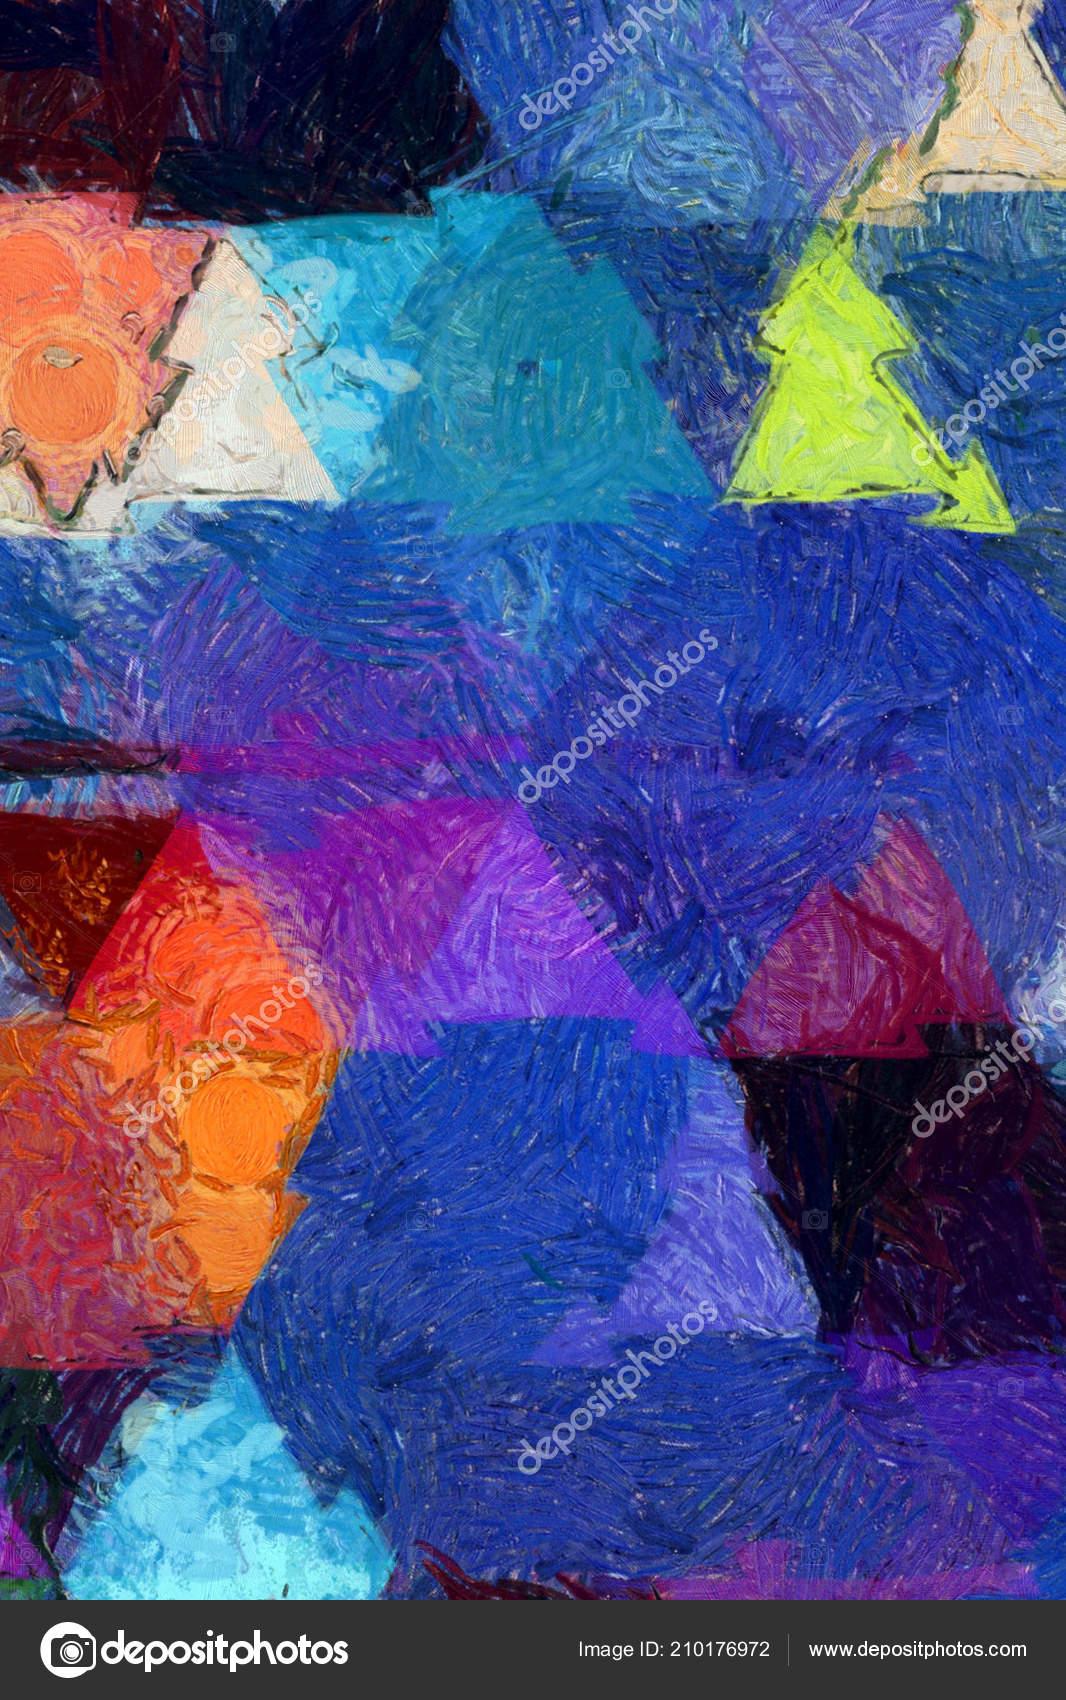 c0ce6545fc Αφηρημένη Ζωγραφική Τέχνη Τοίχων Τυπωμένη Ύλη Καμβά Λαδομπογιά Μοντέρνο  Σχέδιο– εικόνα αρχείου